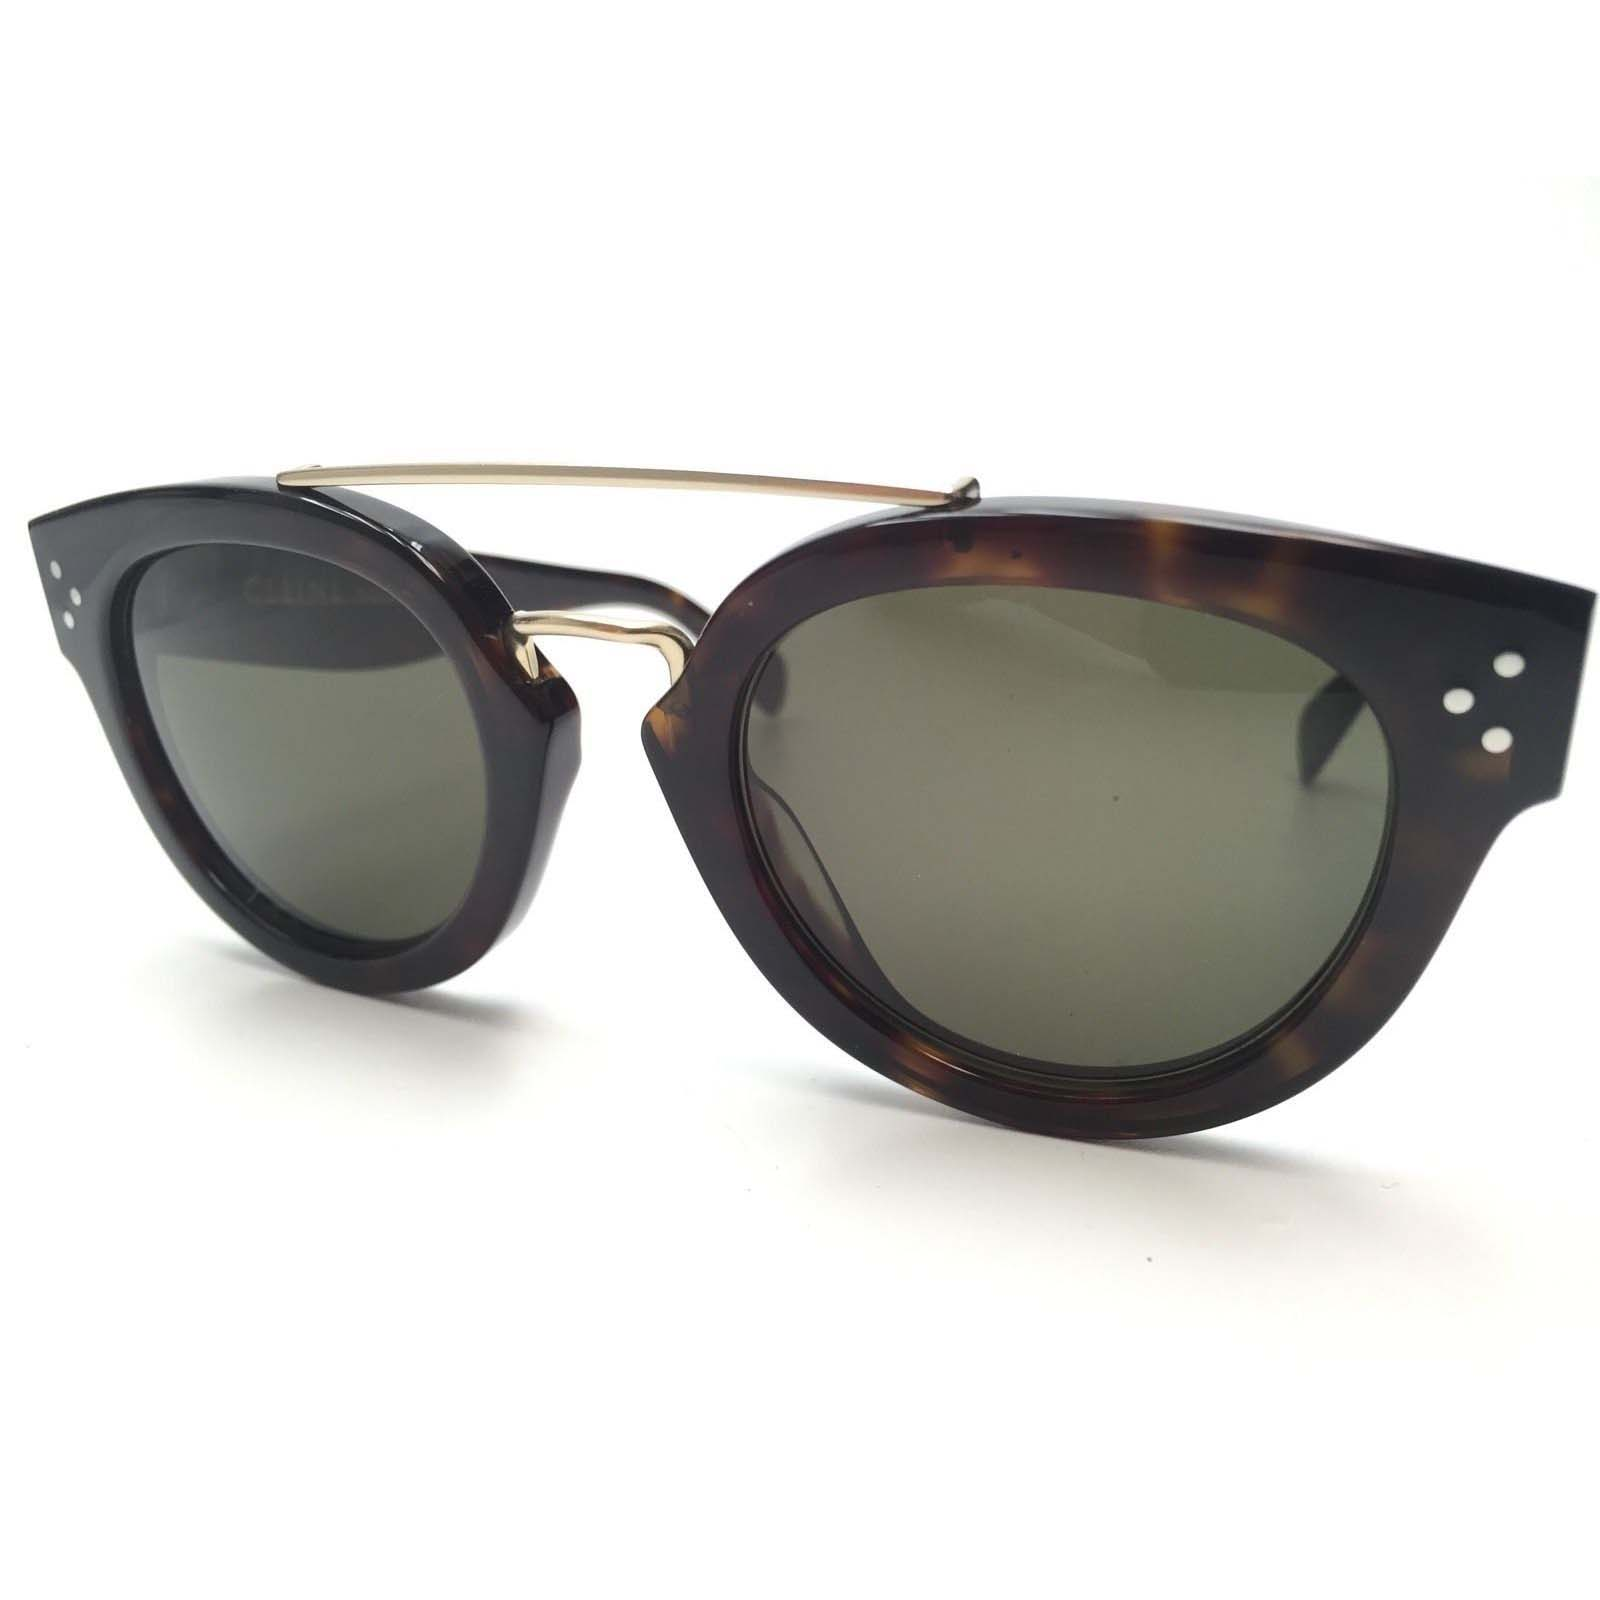 3a6b55becba Celine CL 41043 S Round Sunglasses Dark Havana with Gold Frame Green ...